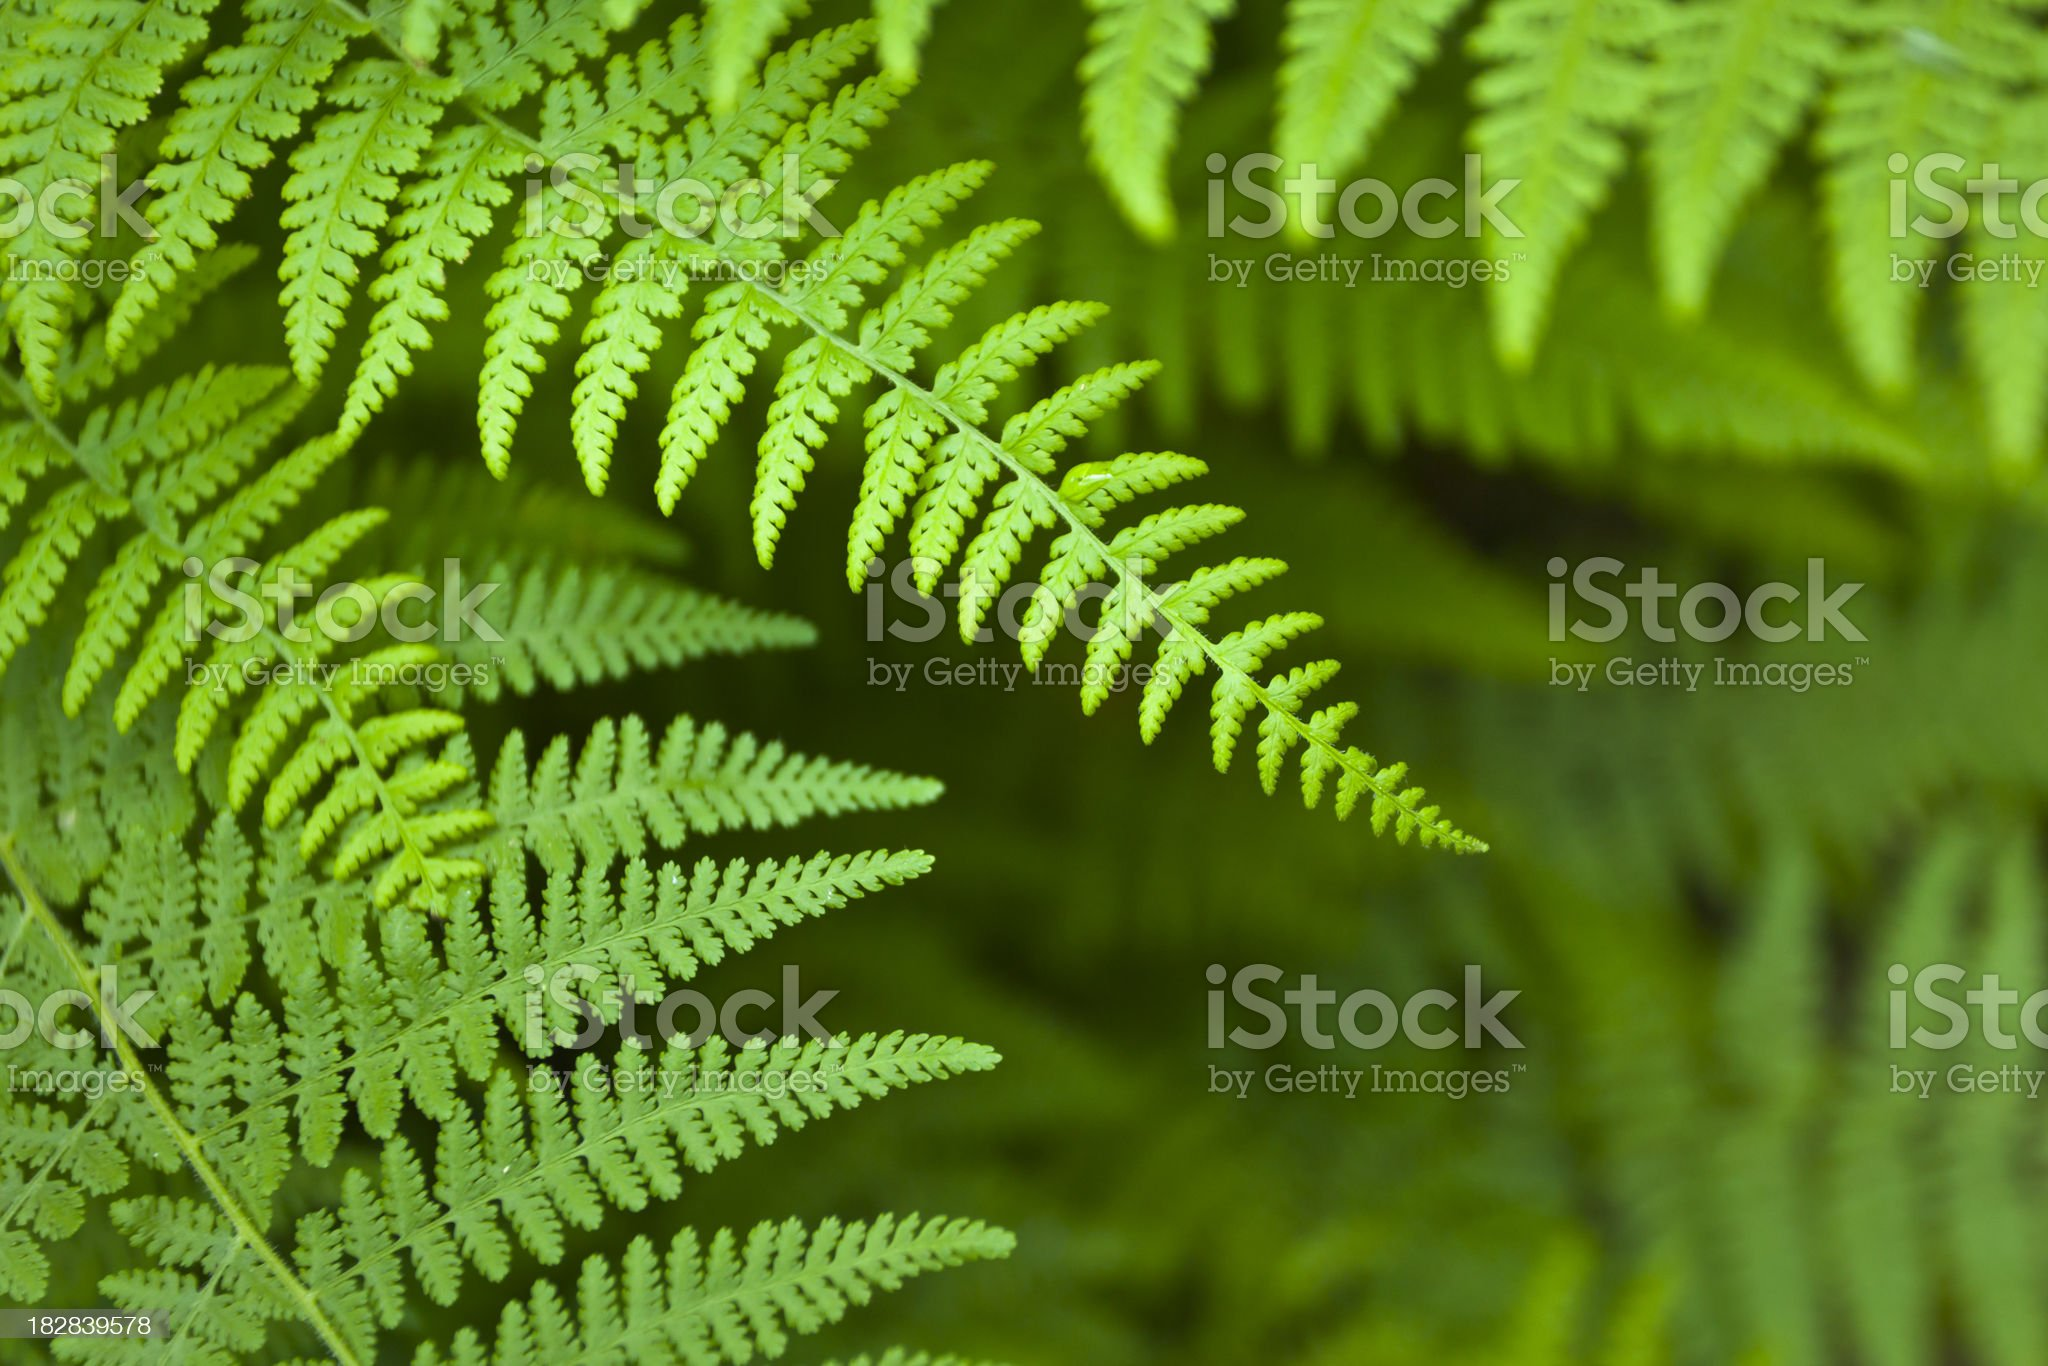 Green Fern royalty-free stock photo